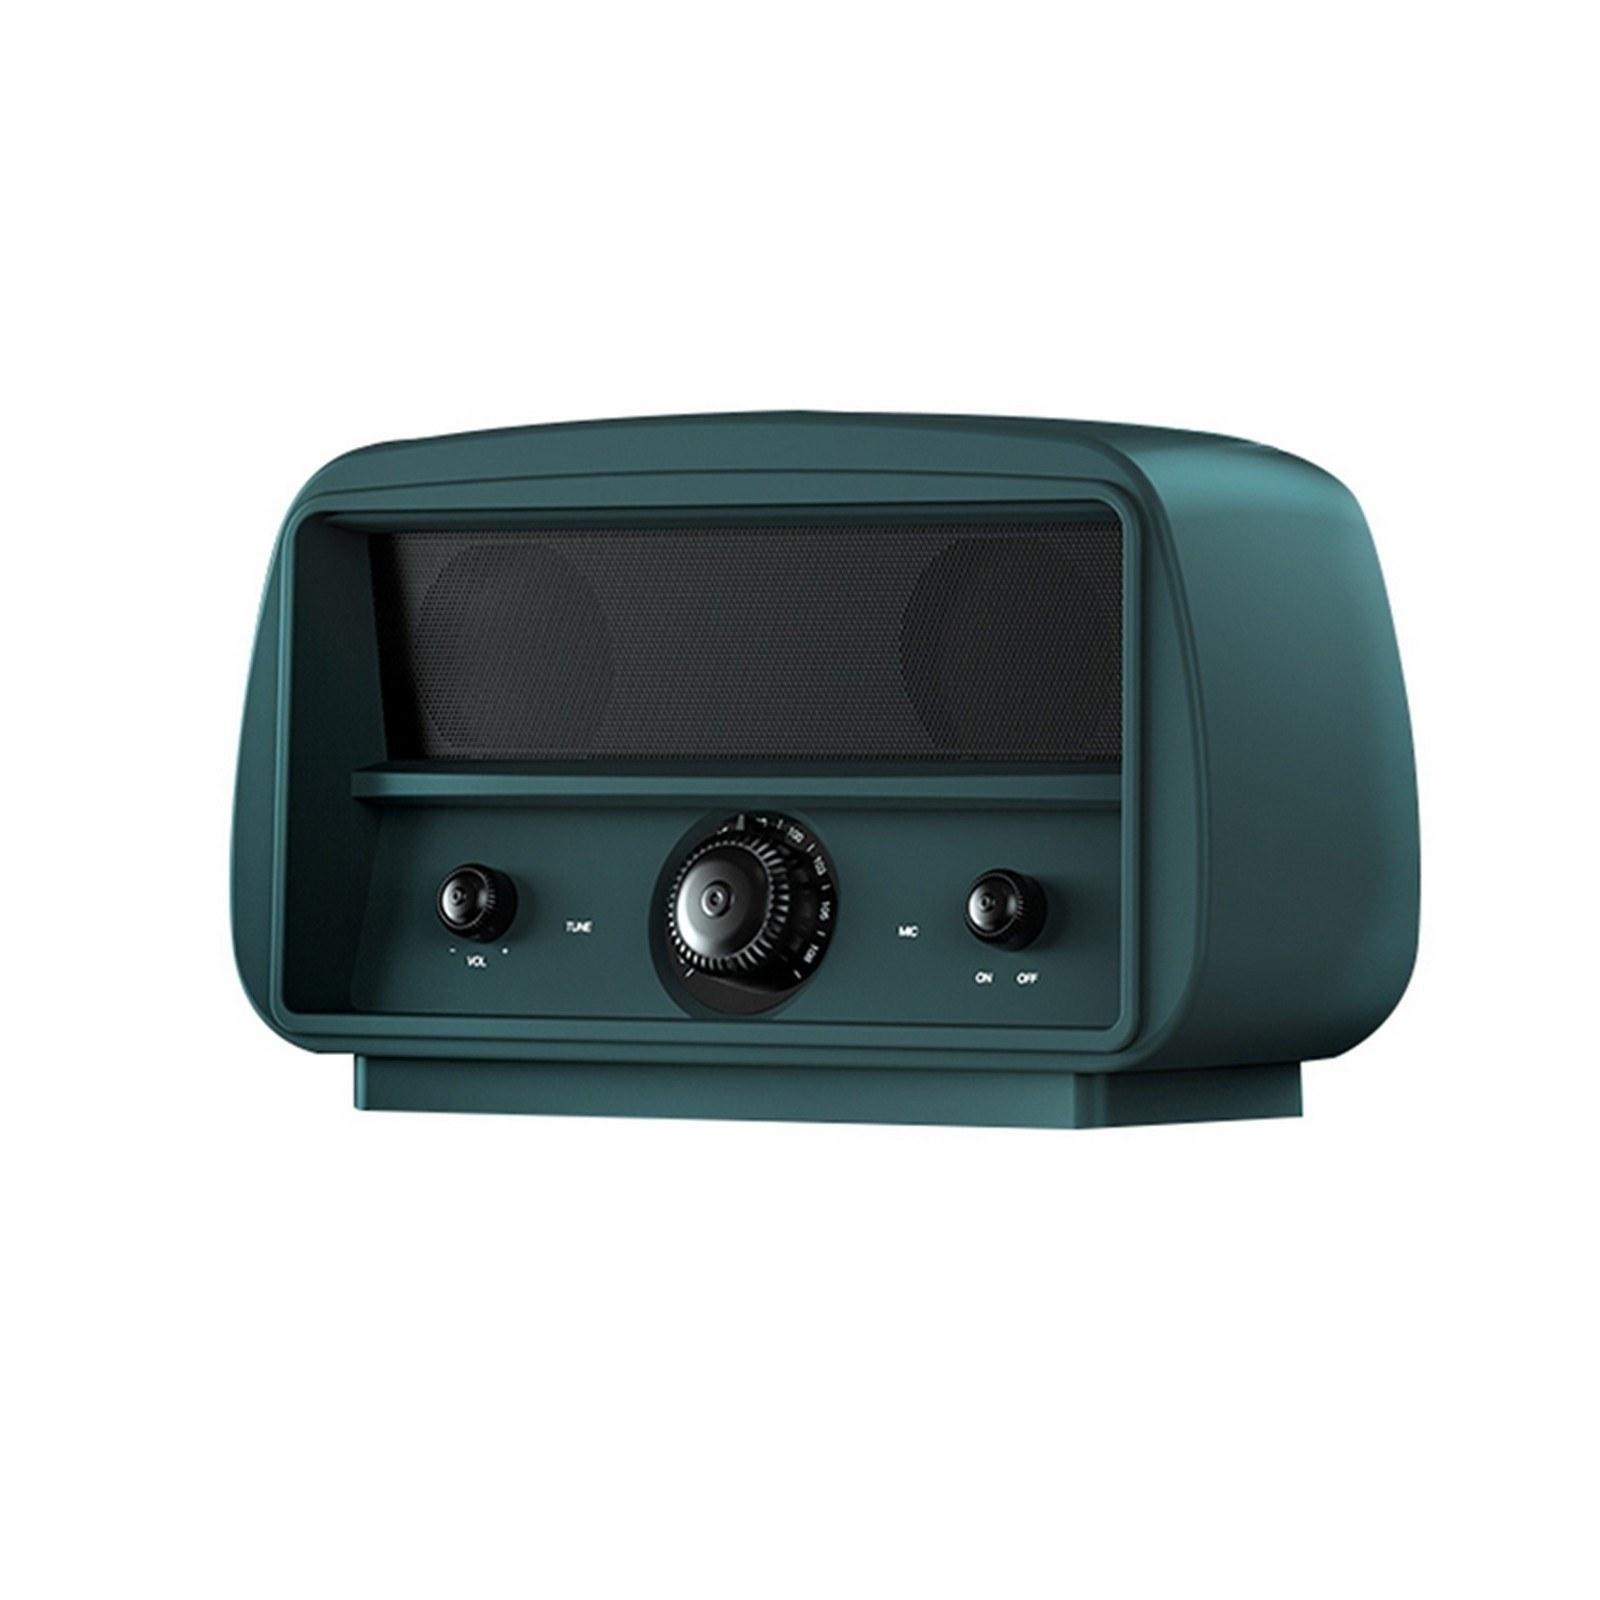 Tomtop - 43% OFF JY-68 BT Wireless Bar Speaker, Free Shipping $27.99